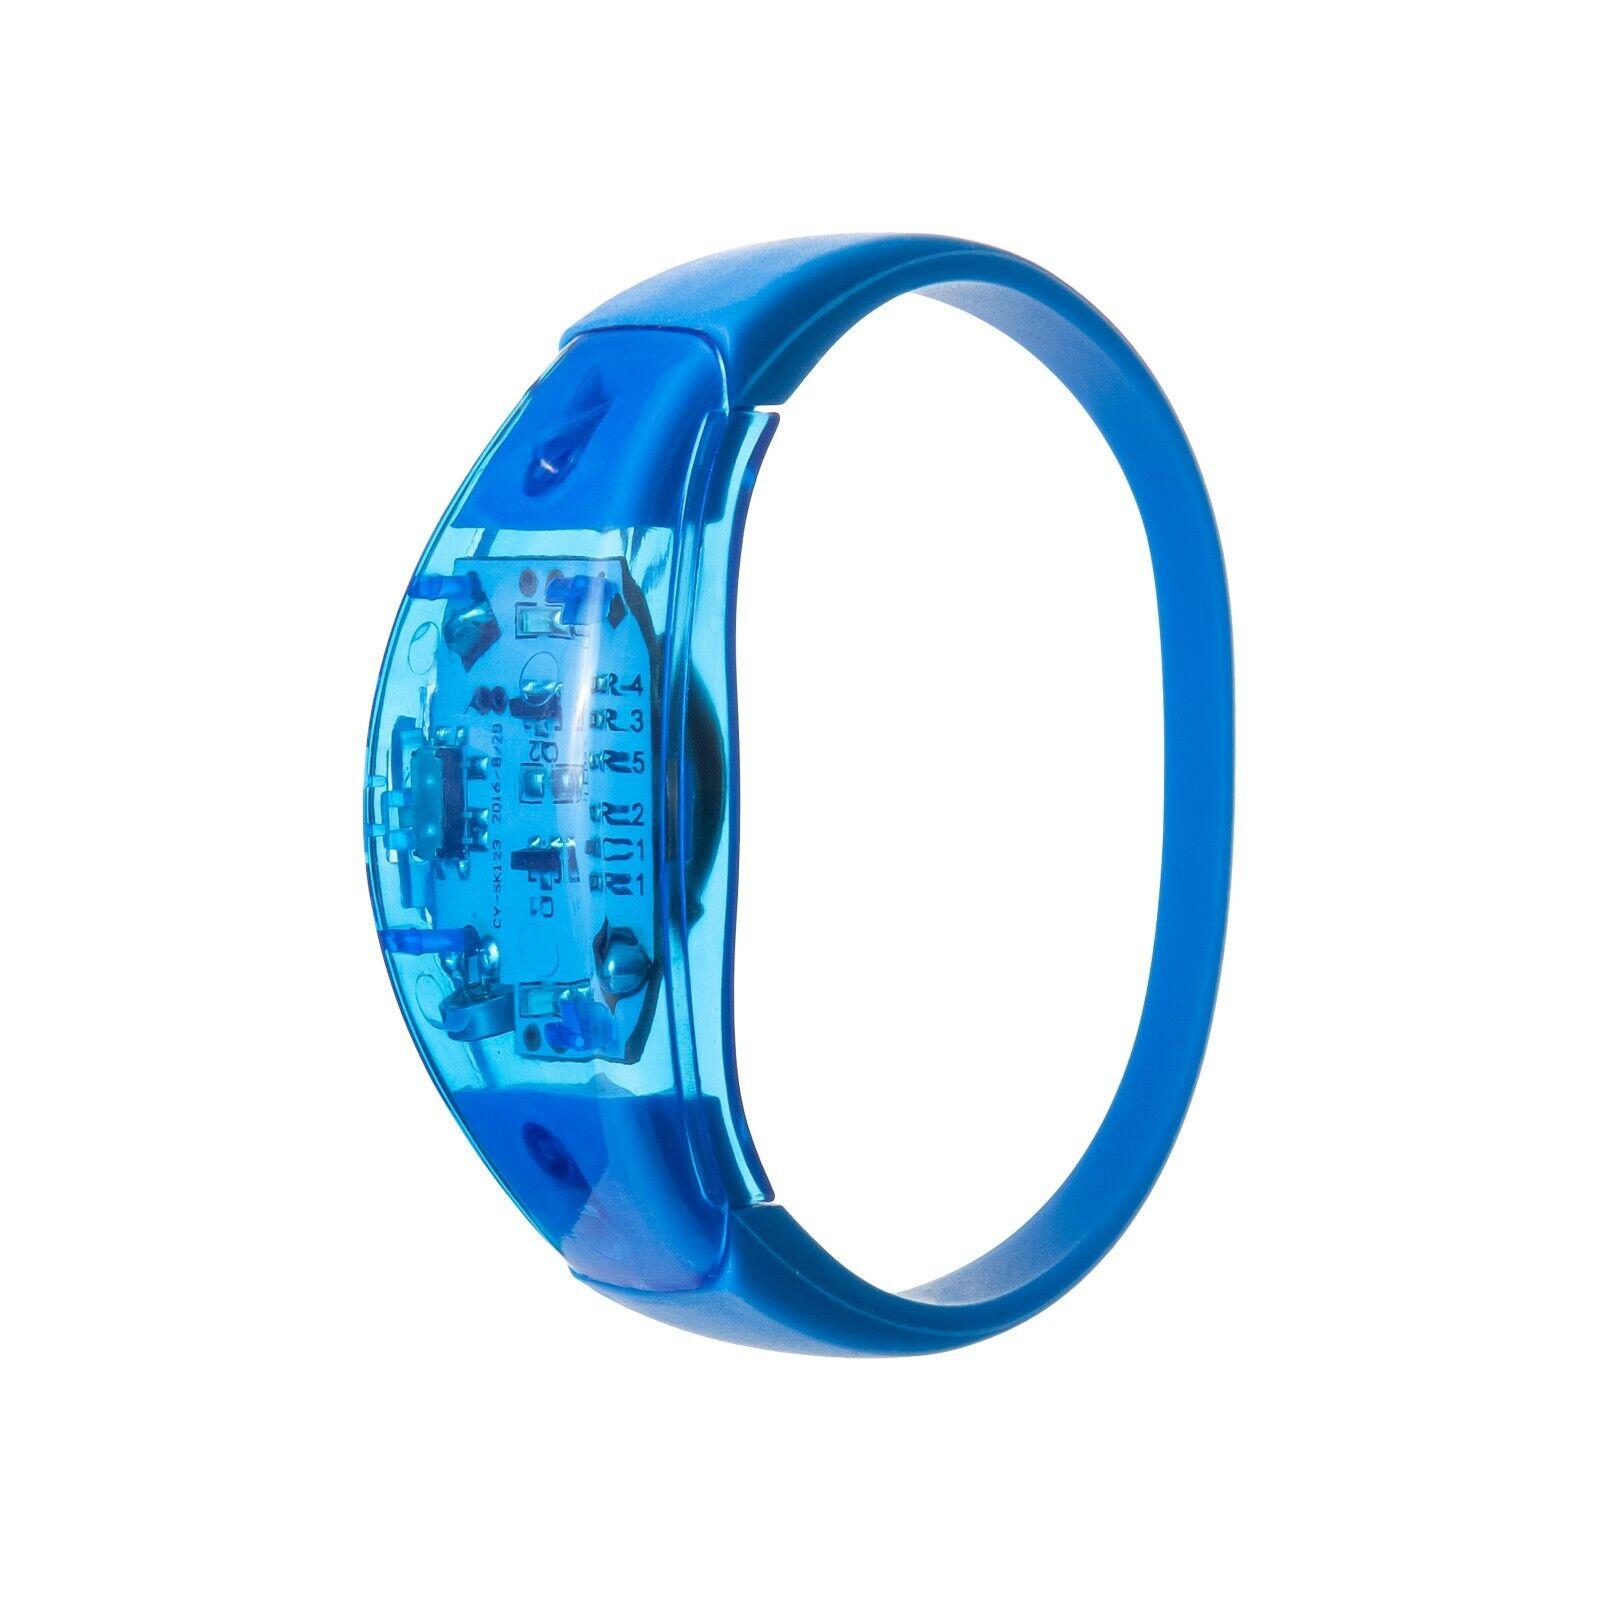 2 Blue Sound Activated LED Bracelet Light Up Flashing Voice Control Music Bangle